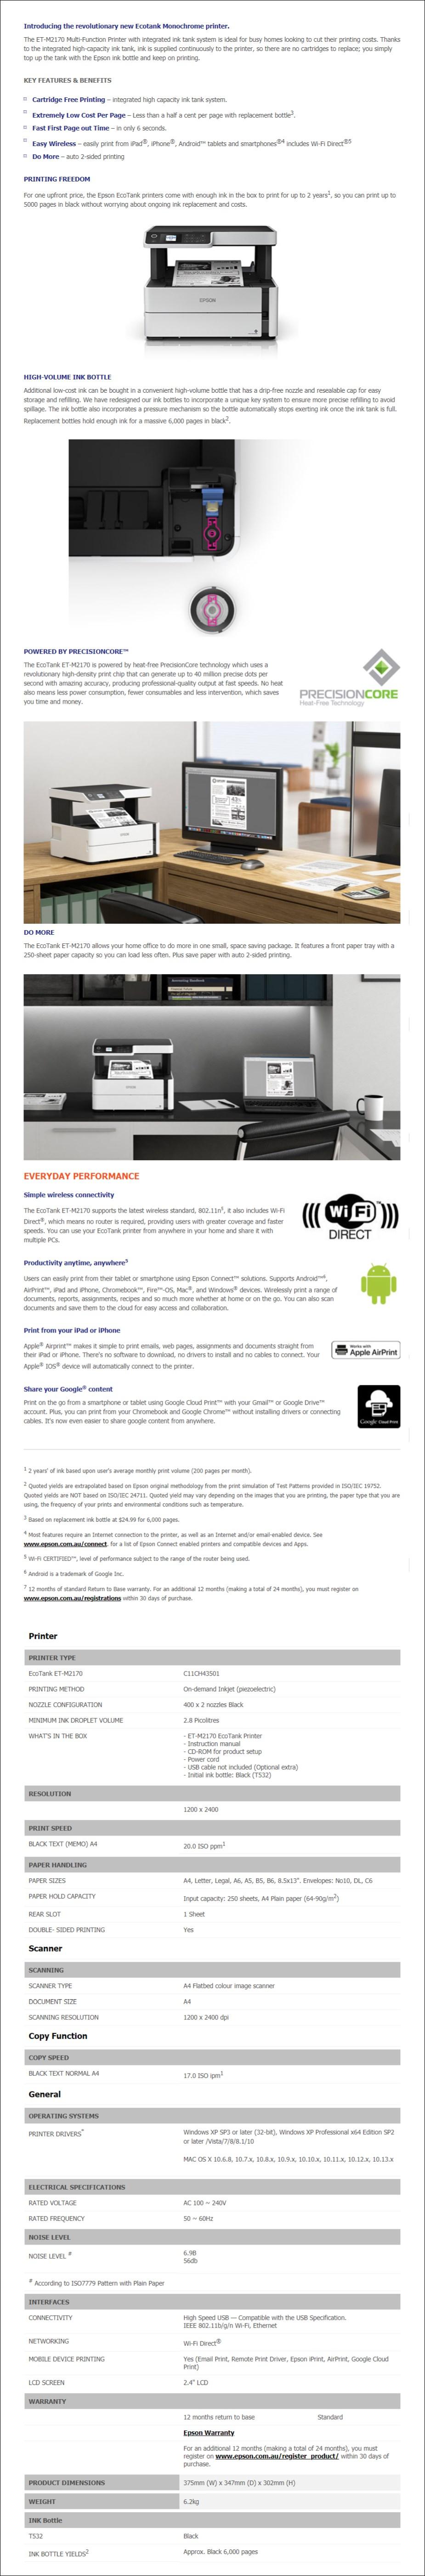 Epson EcoTank ET-M2170 Monochrome A4 Multifunction Wireless Inkjet Printer - Overview 1